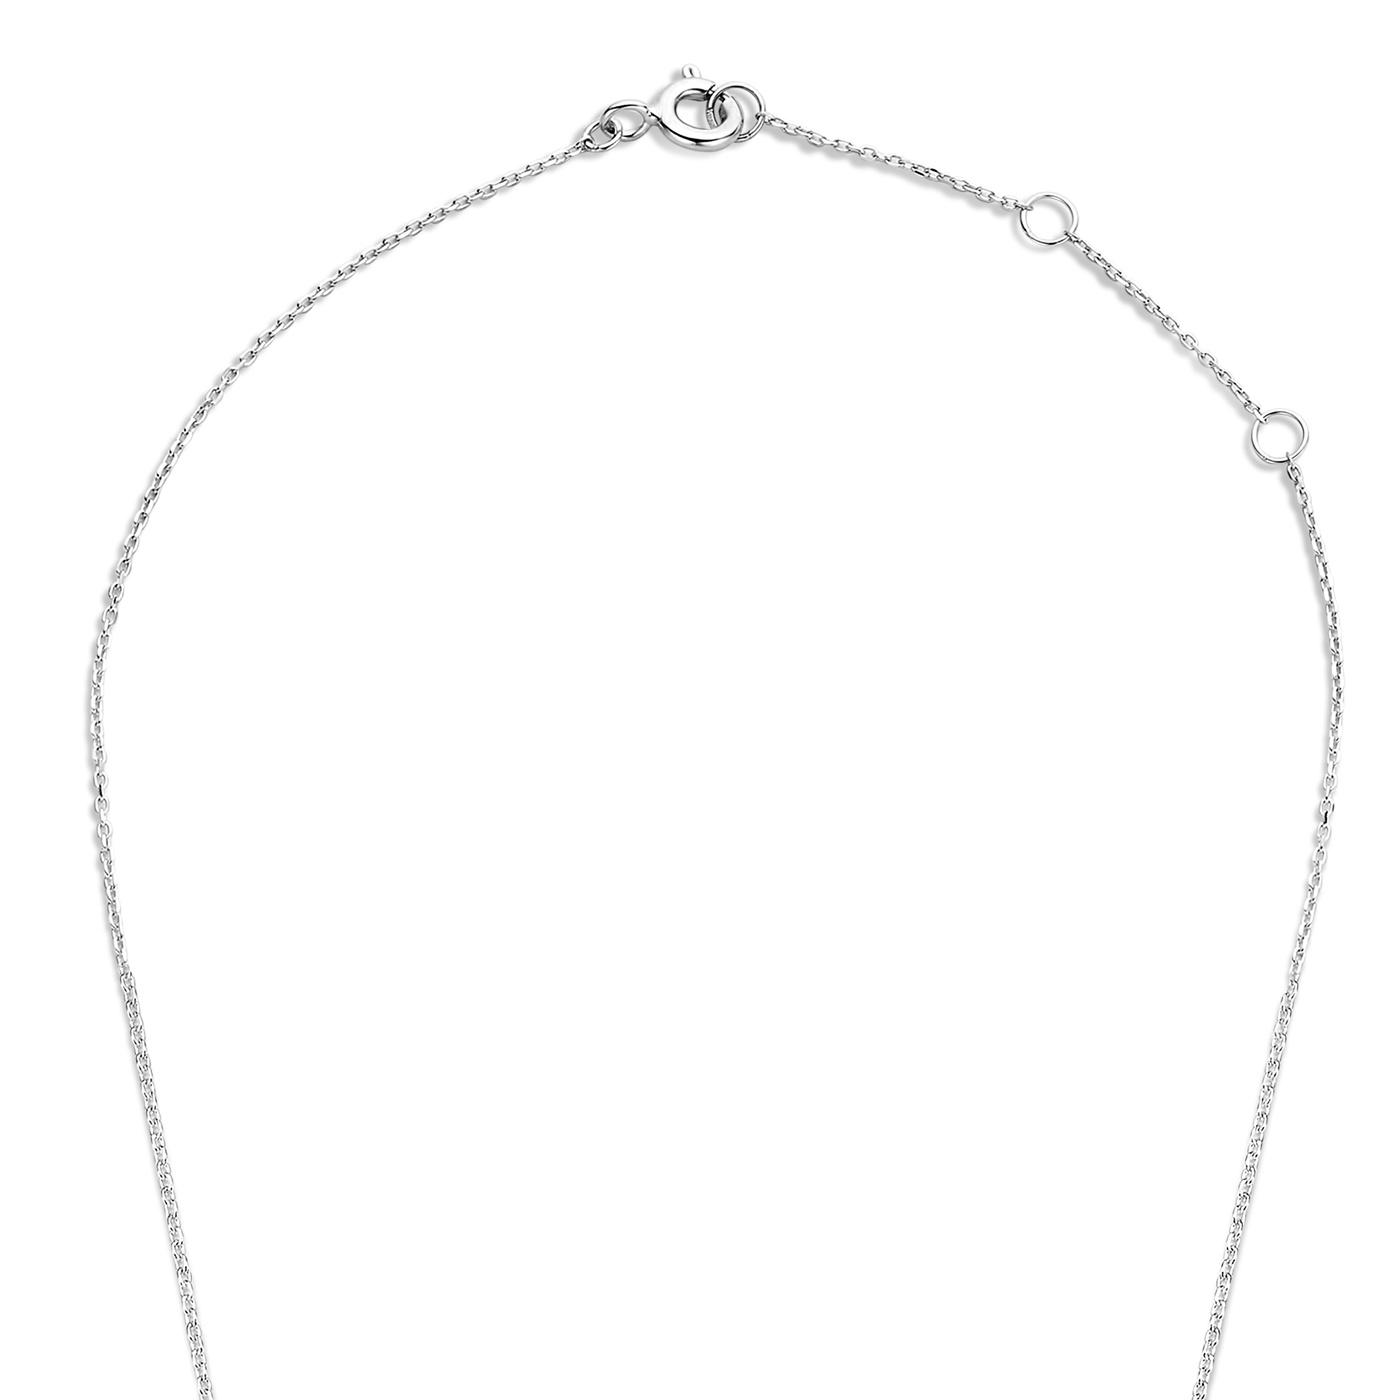 Isabel Bernard Saint Germain Hélione 14 carat white gold necklace zirconia